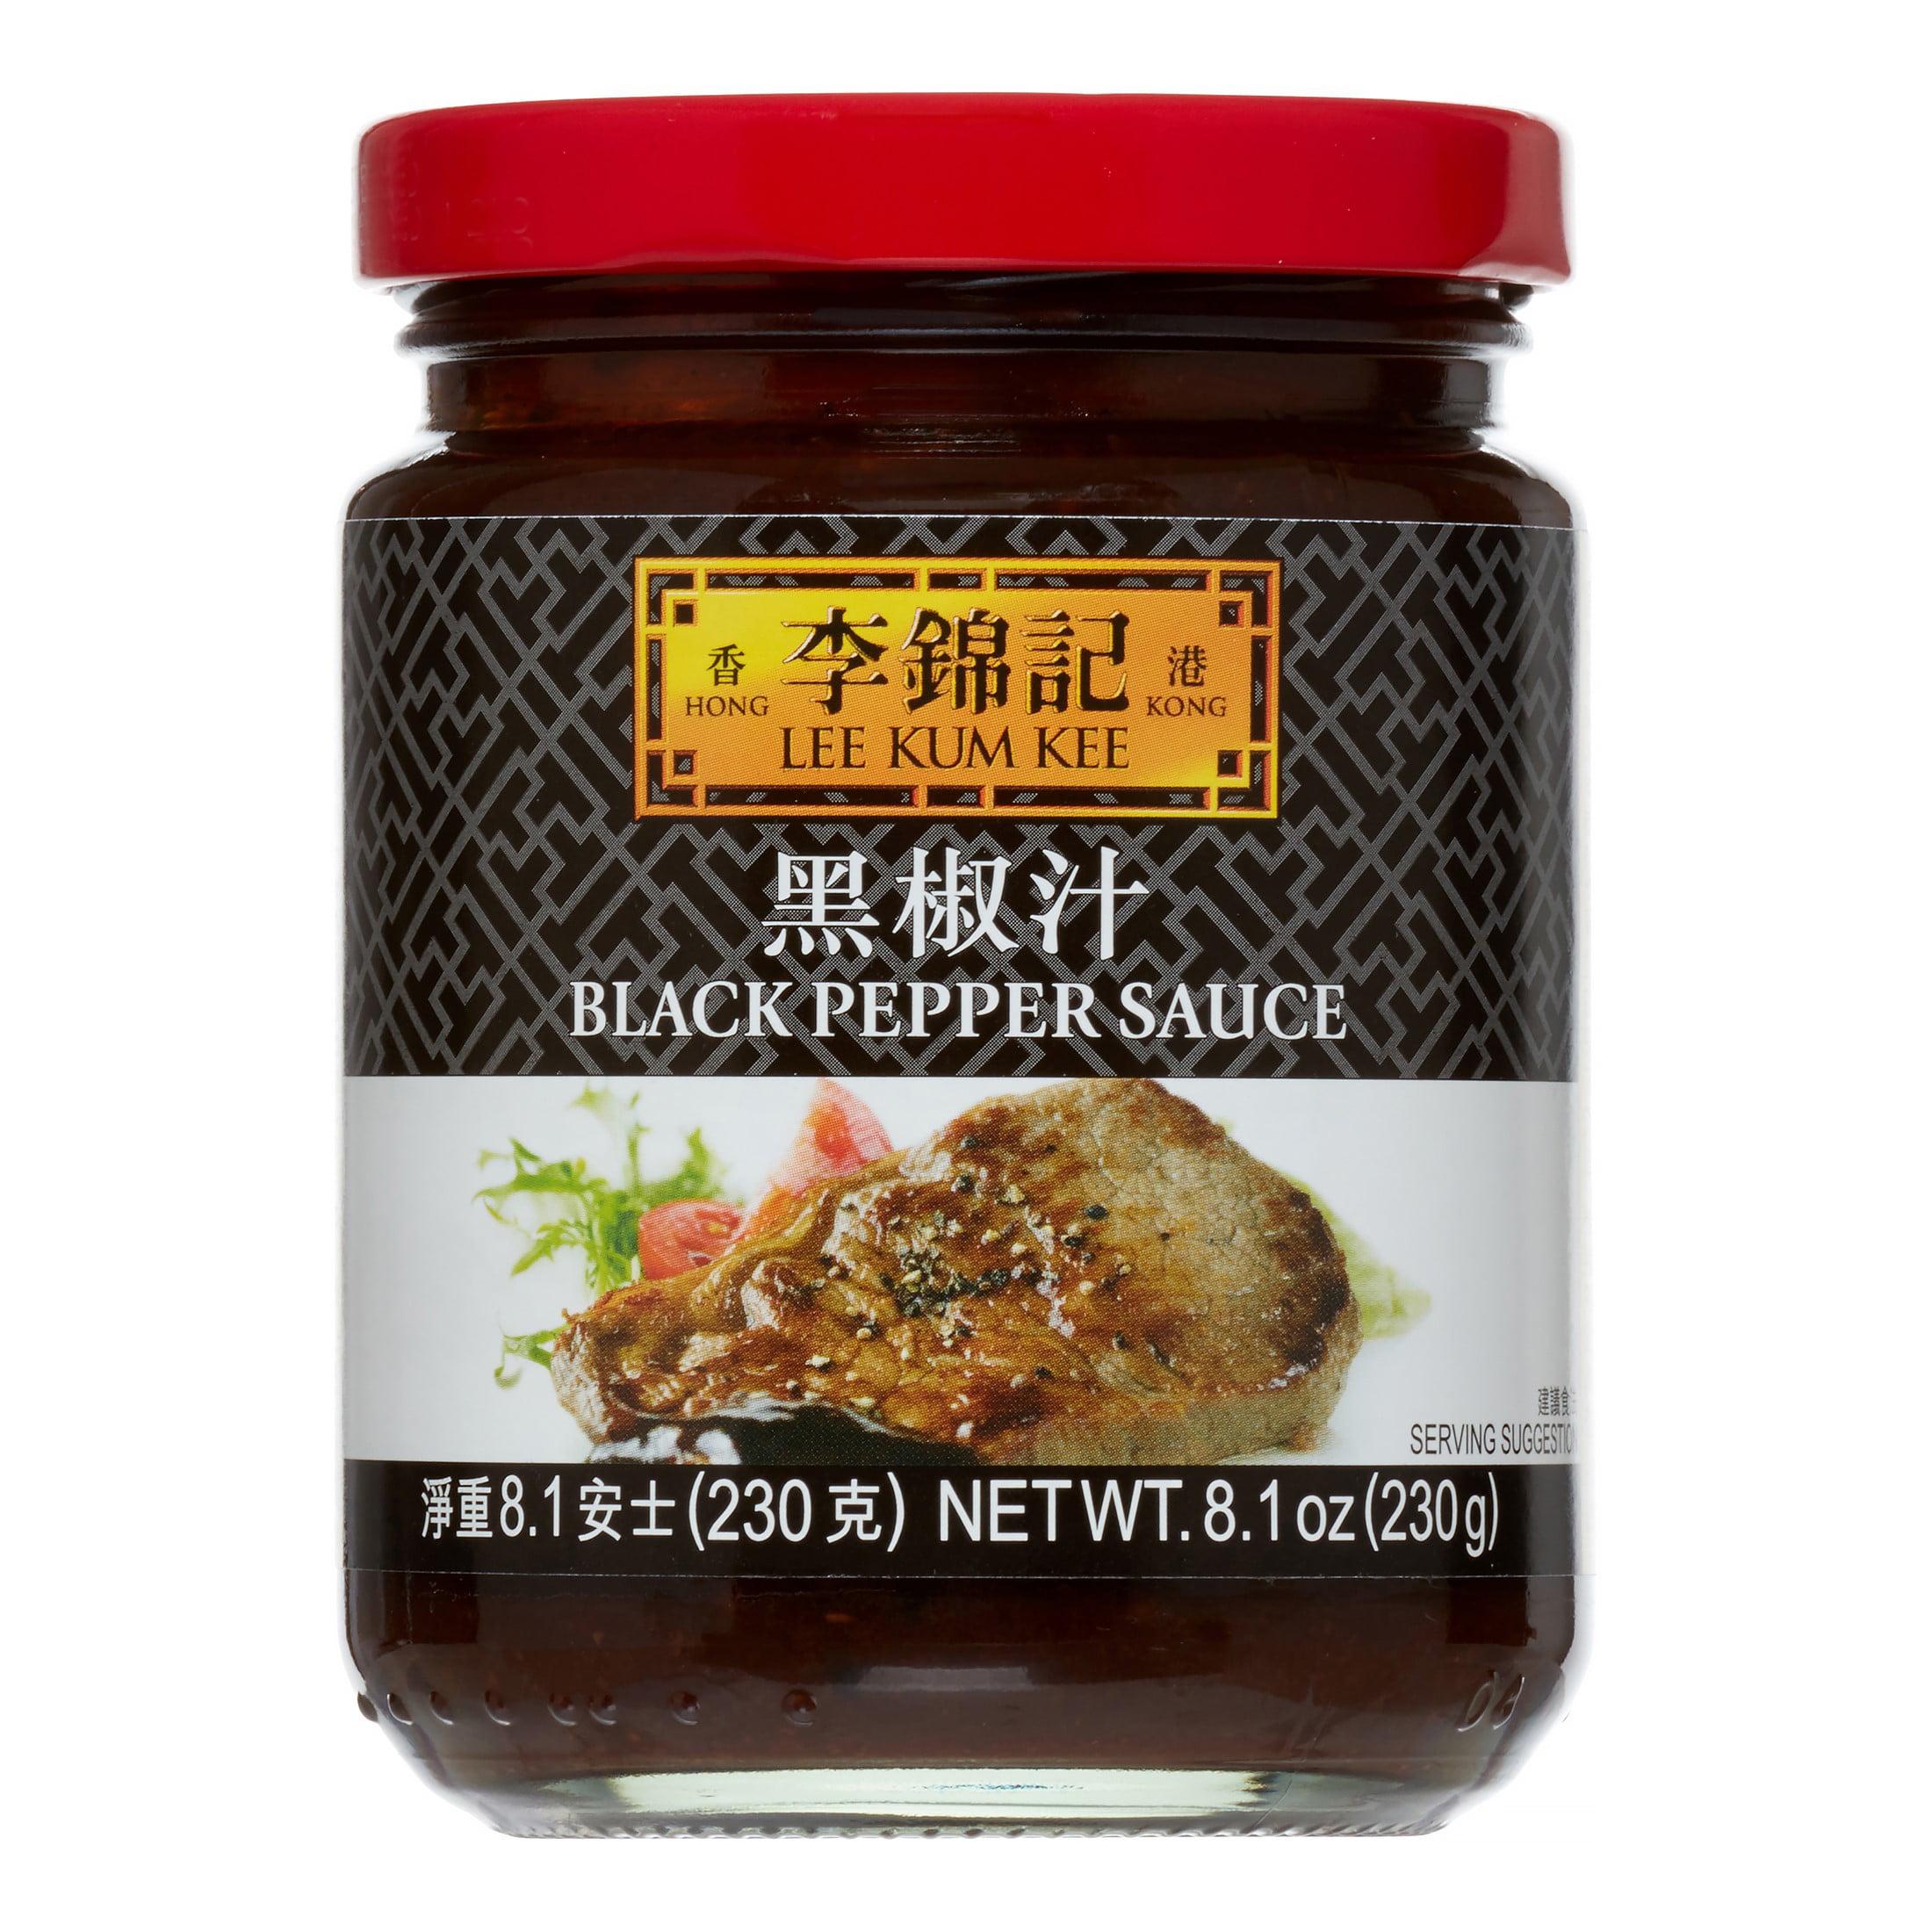 Lee Kum Kee Black Pepper Sauce, 8.1 oz by Lee Kum Kee